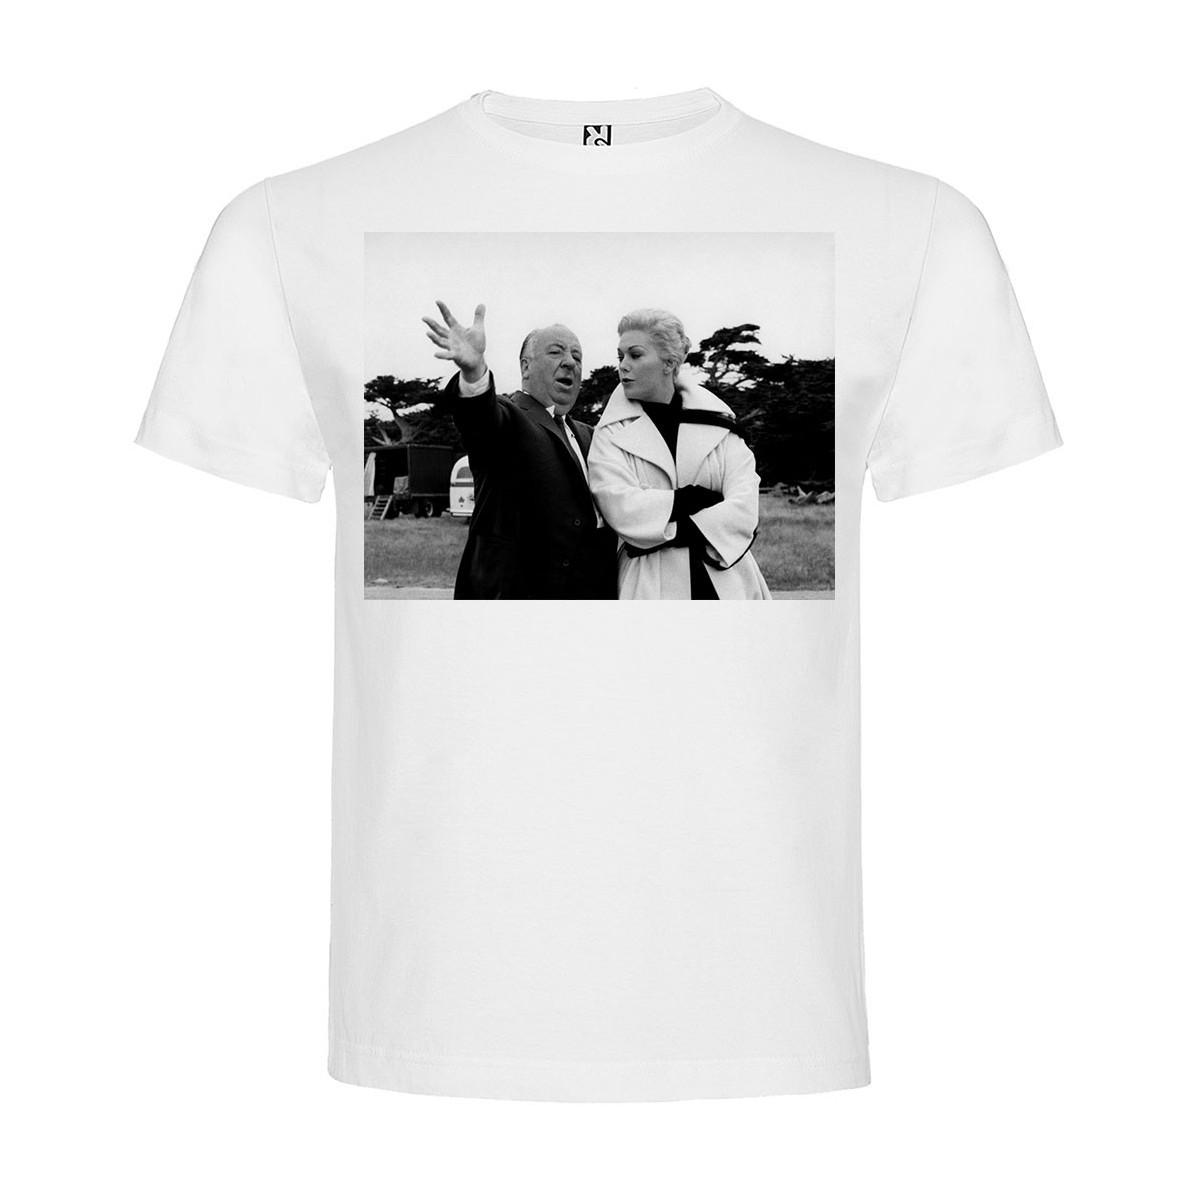 T-Shirt Sueurs froides - Vertigo - col rond homme blanc